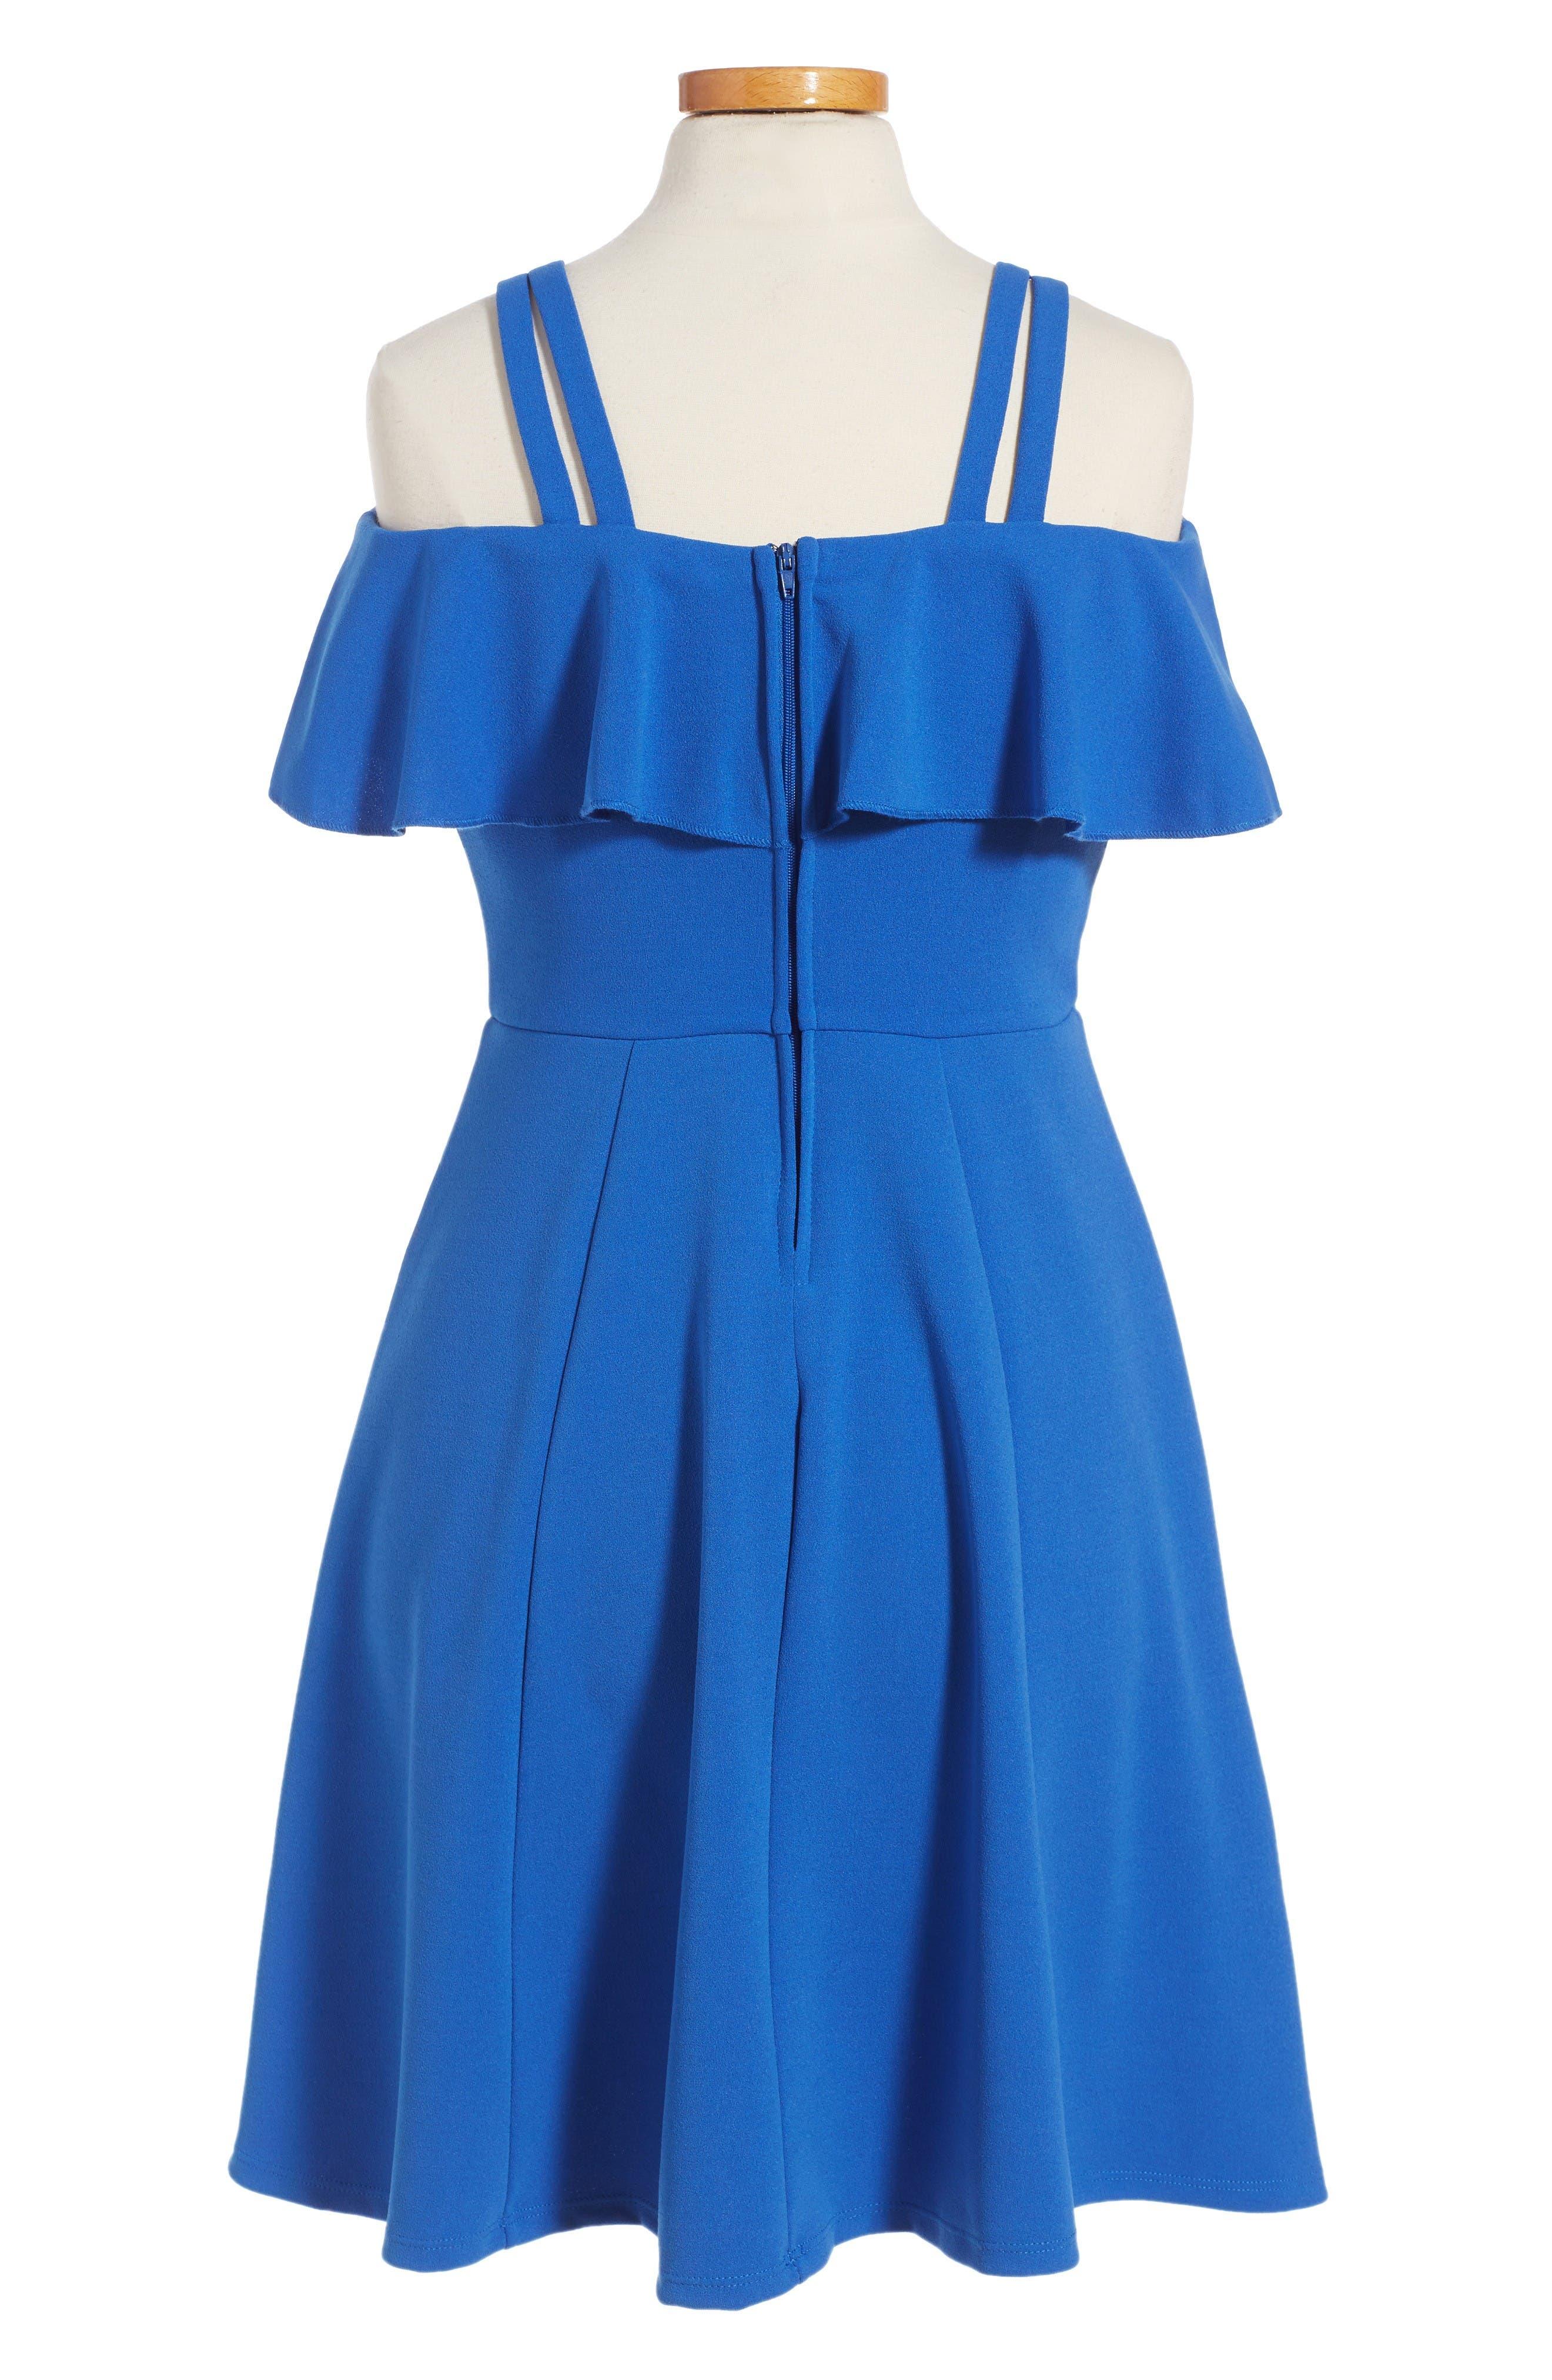 Off the Shoulder Ruffle Dress,                             Alternate thumbnail 2, color,                             Royal Blue